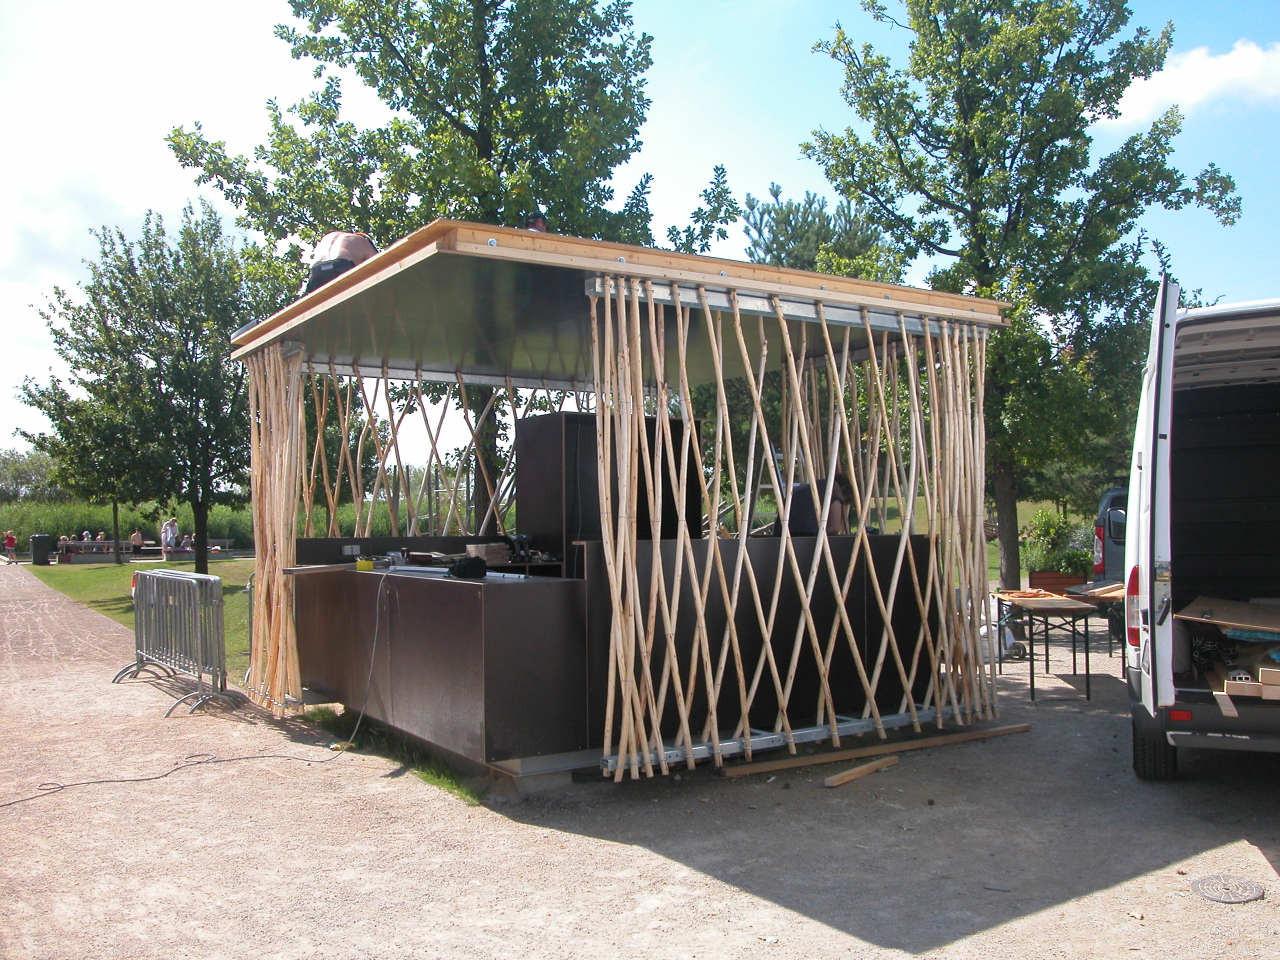 Simple-Tech-Kiosk / partnerundpartner-architekten, © Stefan Günther